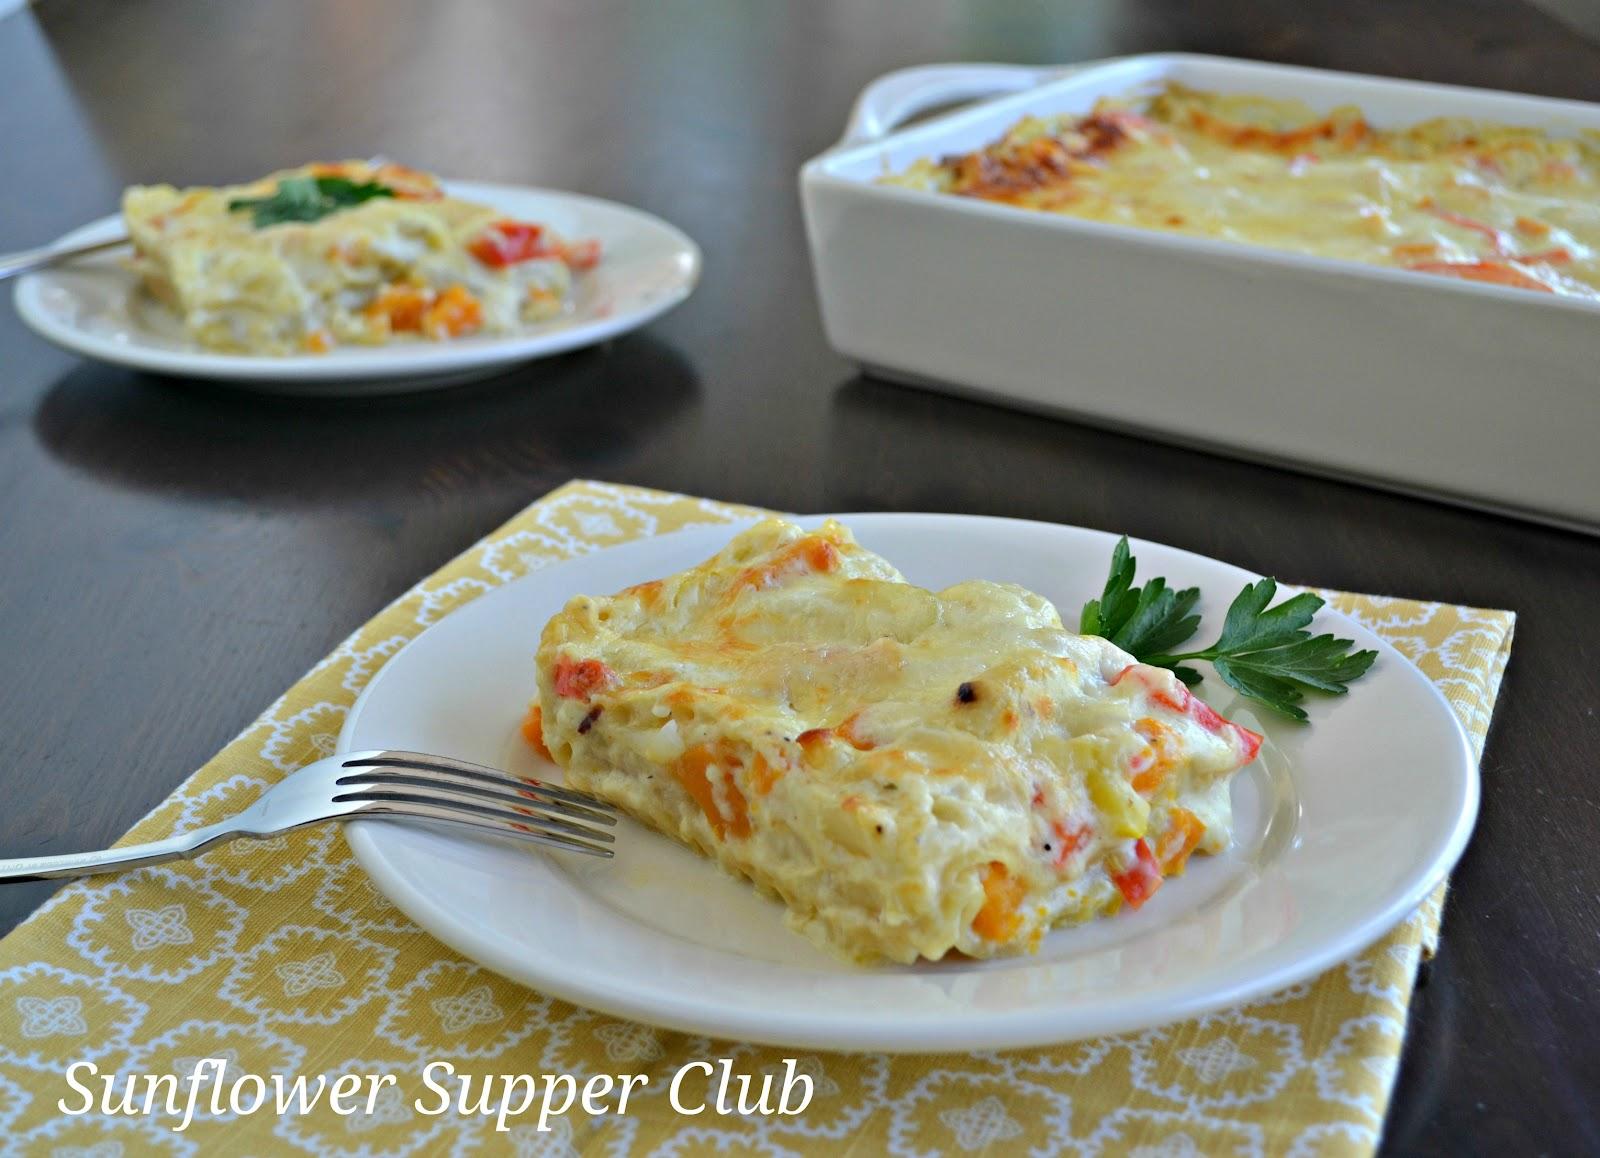 Sunflower Supper Club: Roasted Vegetable Lasagna